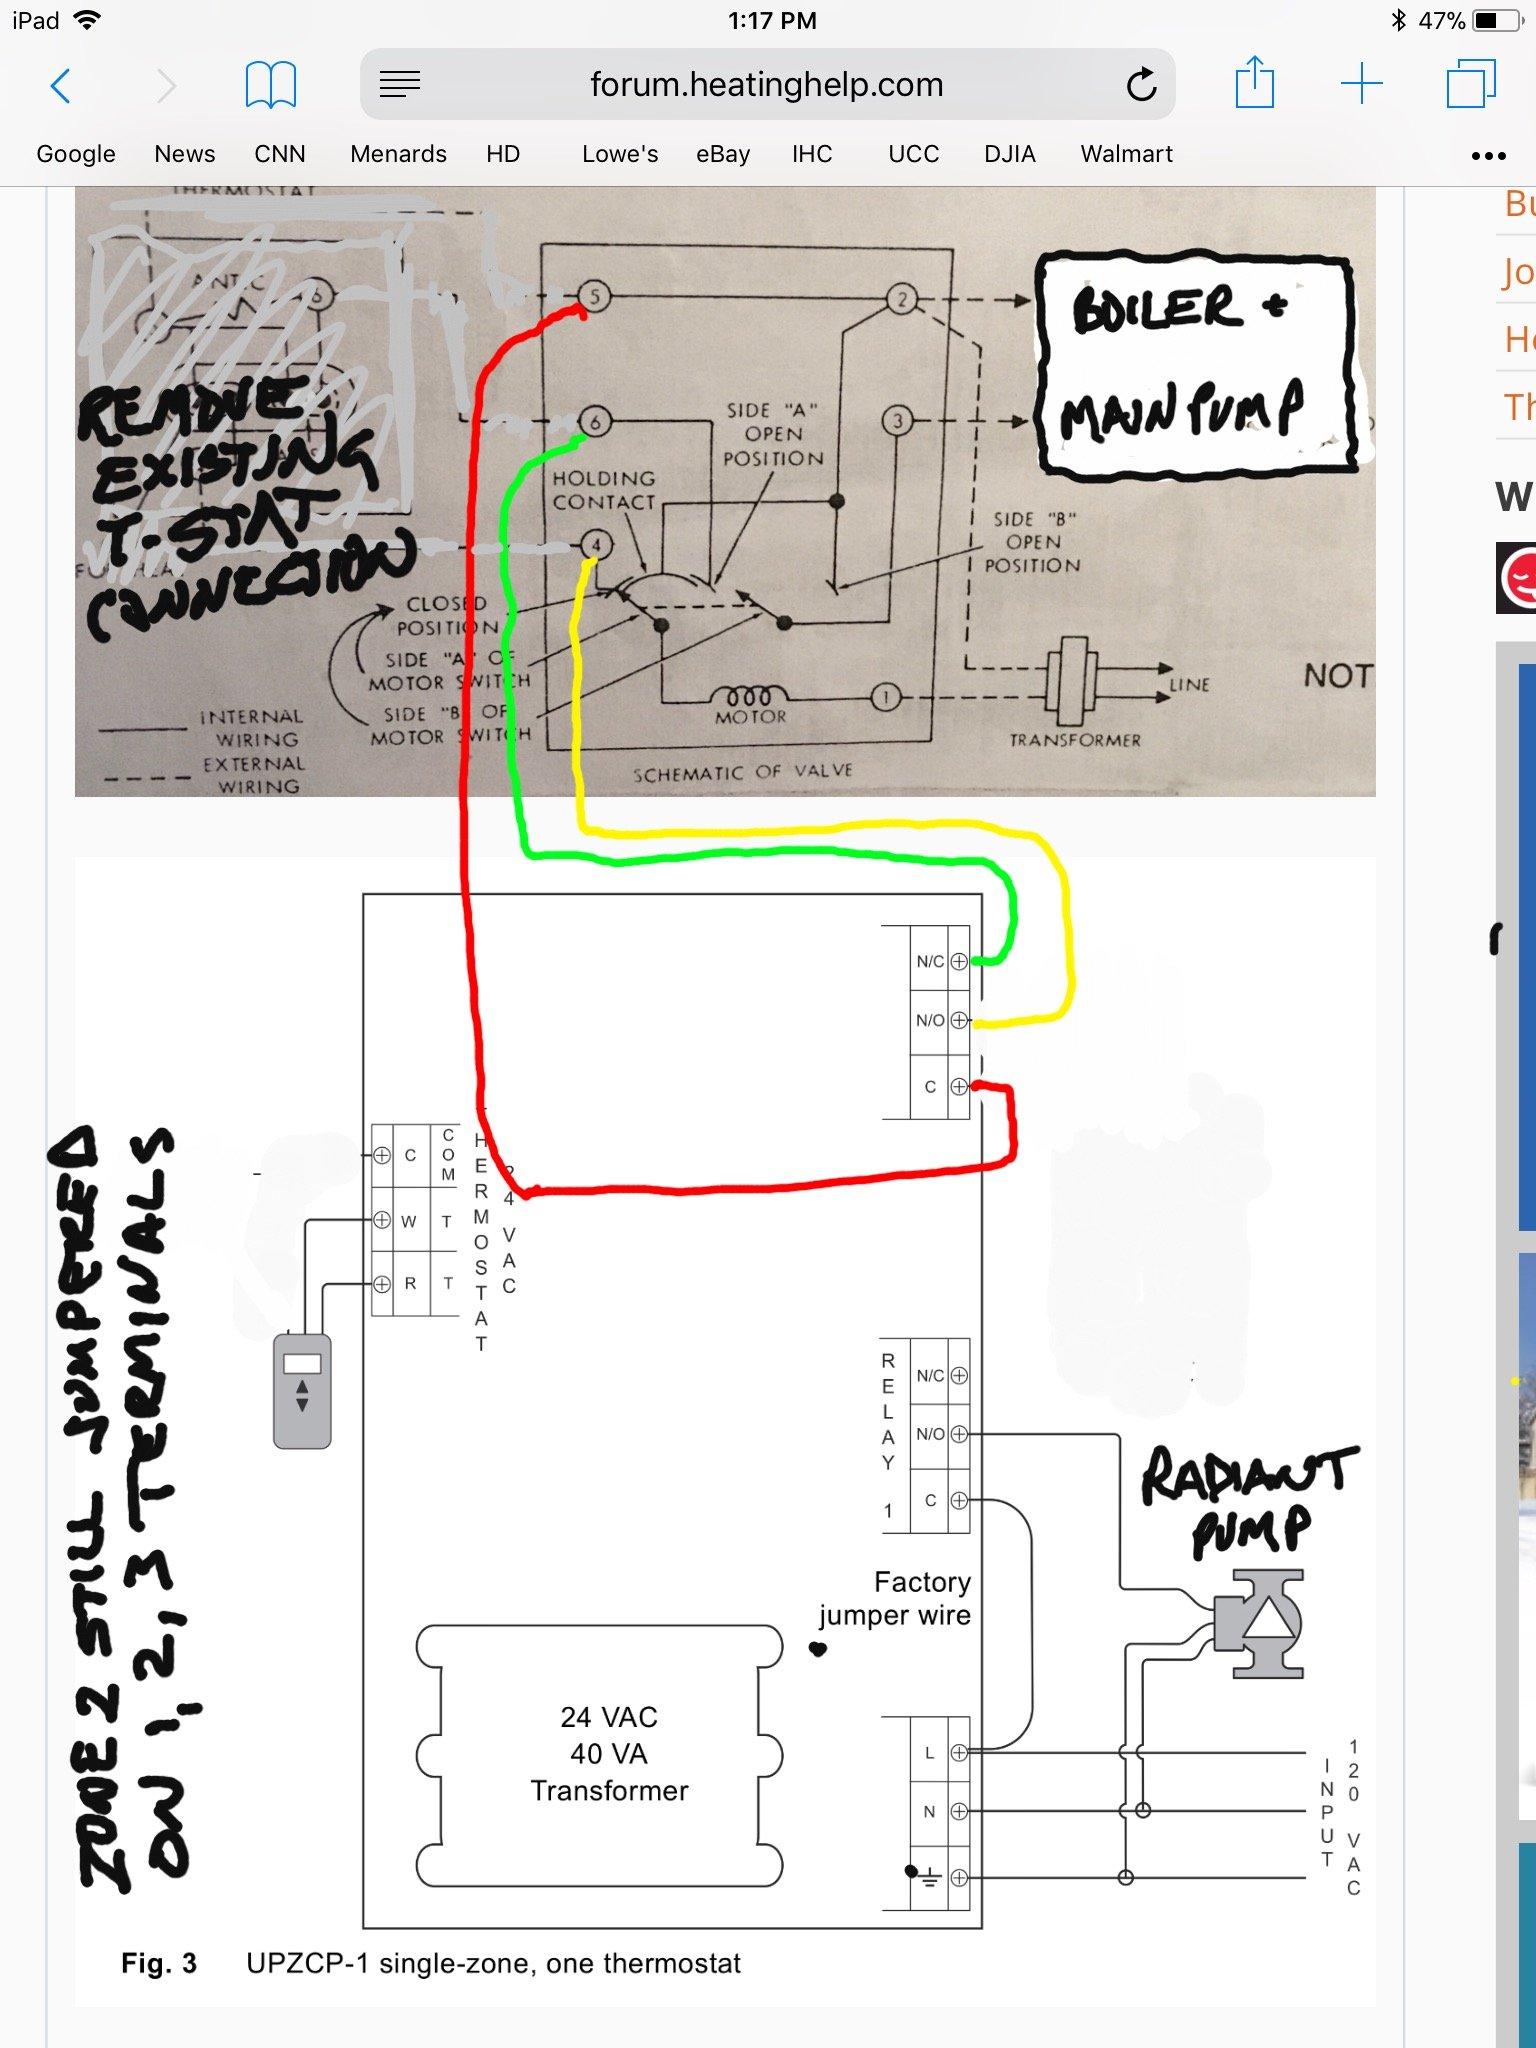 Ms402 Grundfos Pump Control Box Wiring Diagram 1993 Ford Explorer Stereo Wiring Diagram Begeboy Wiring Diagram Source